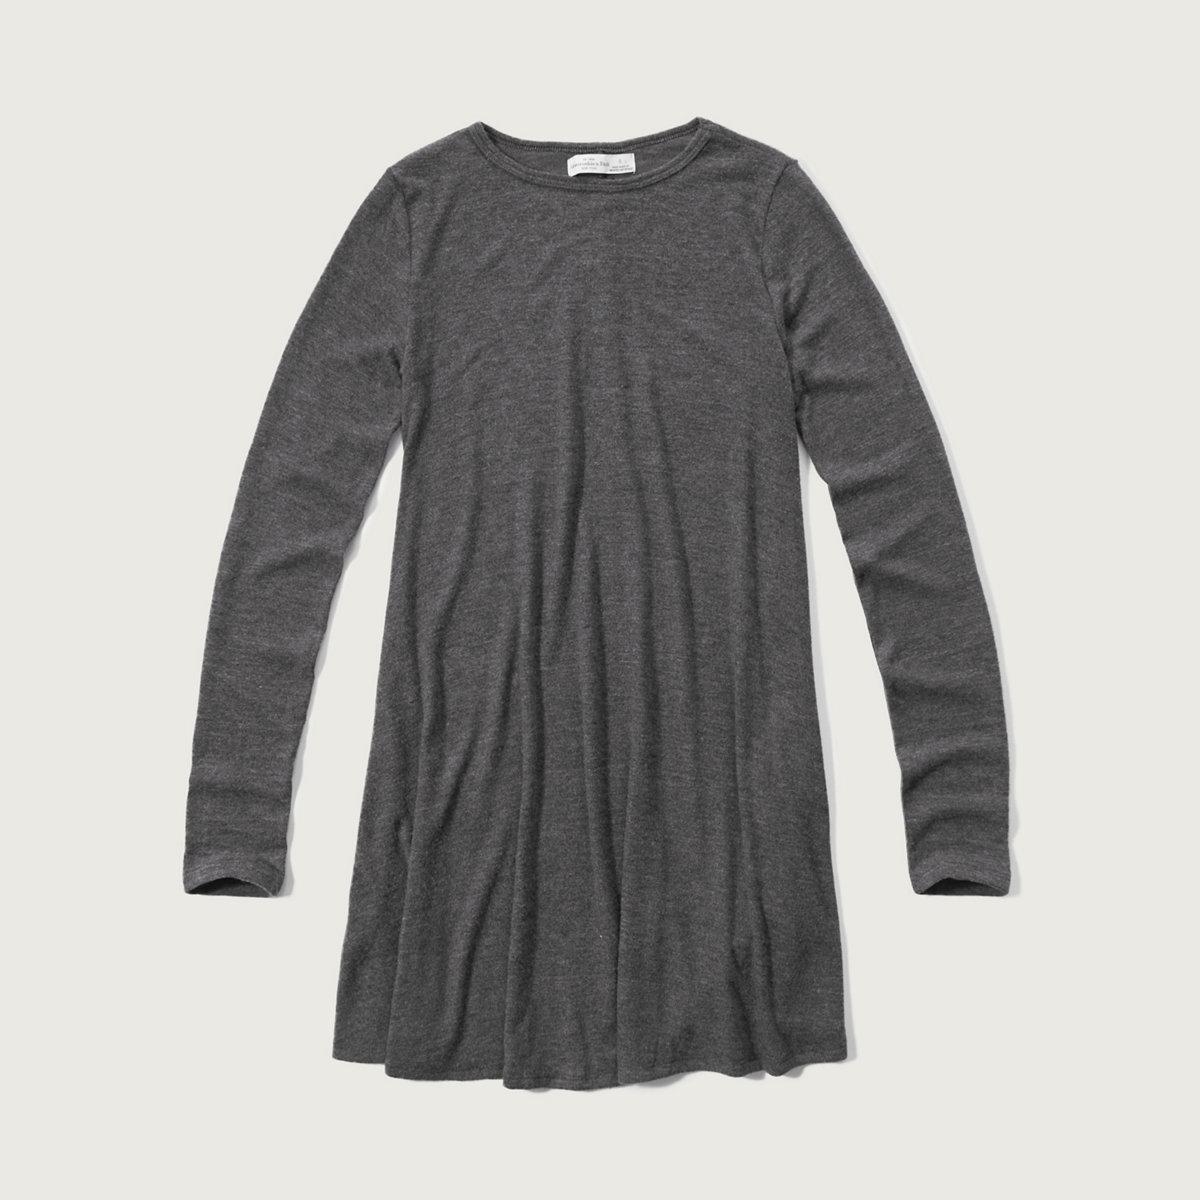 Textured Easy Dress